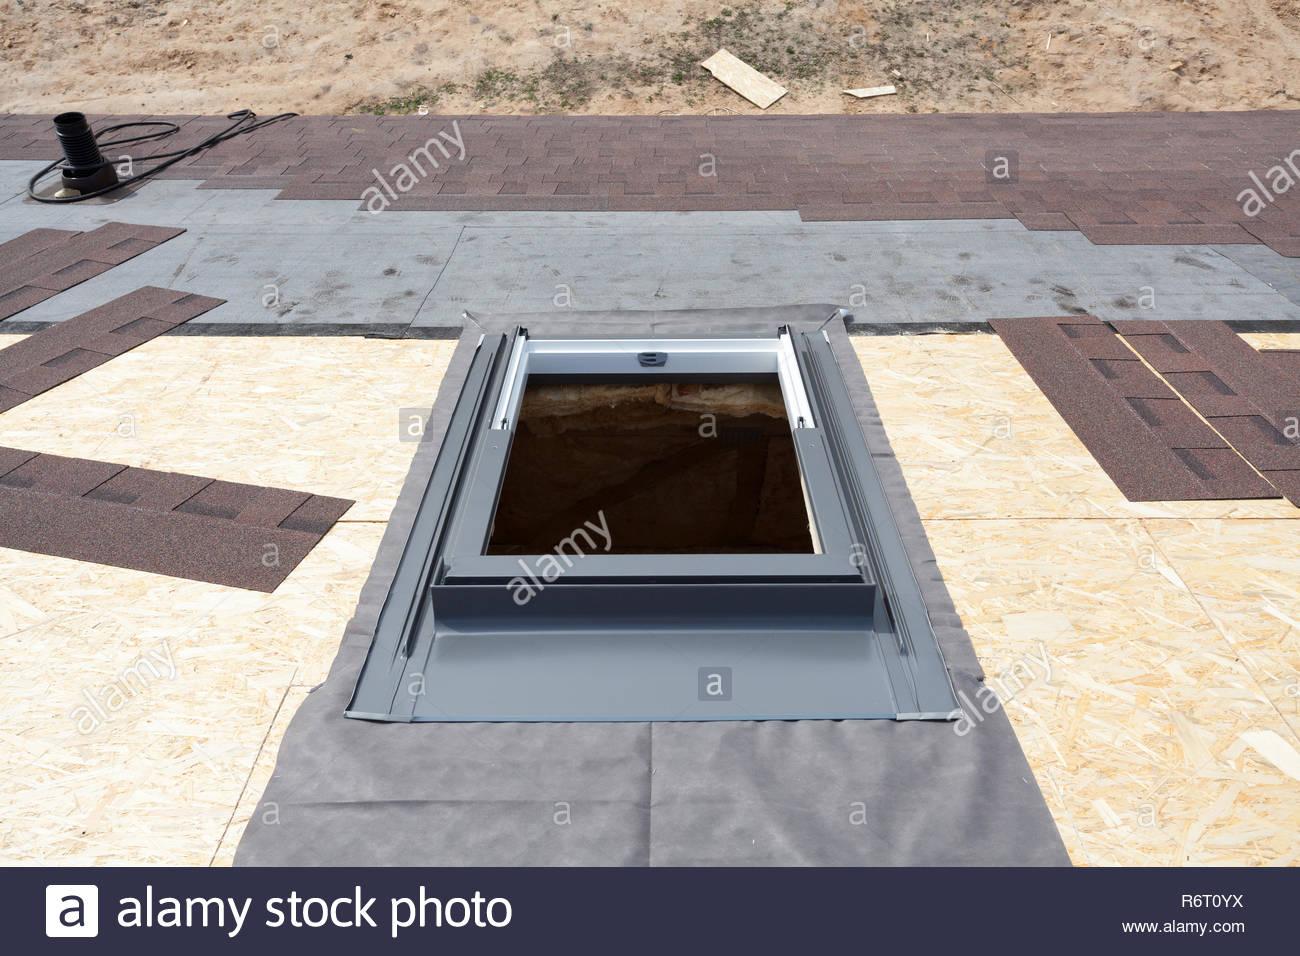 Installing Window Skylight On A Roof With Asphalt Shingles